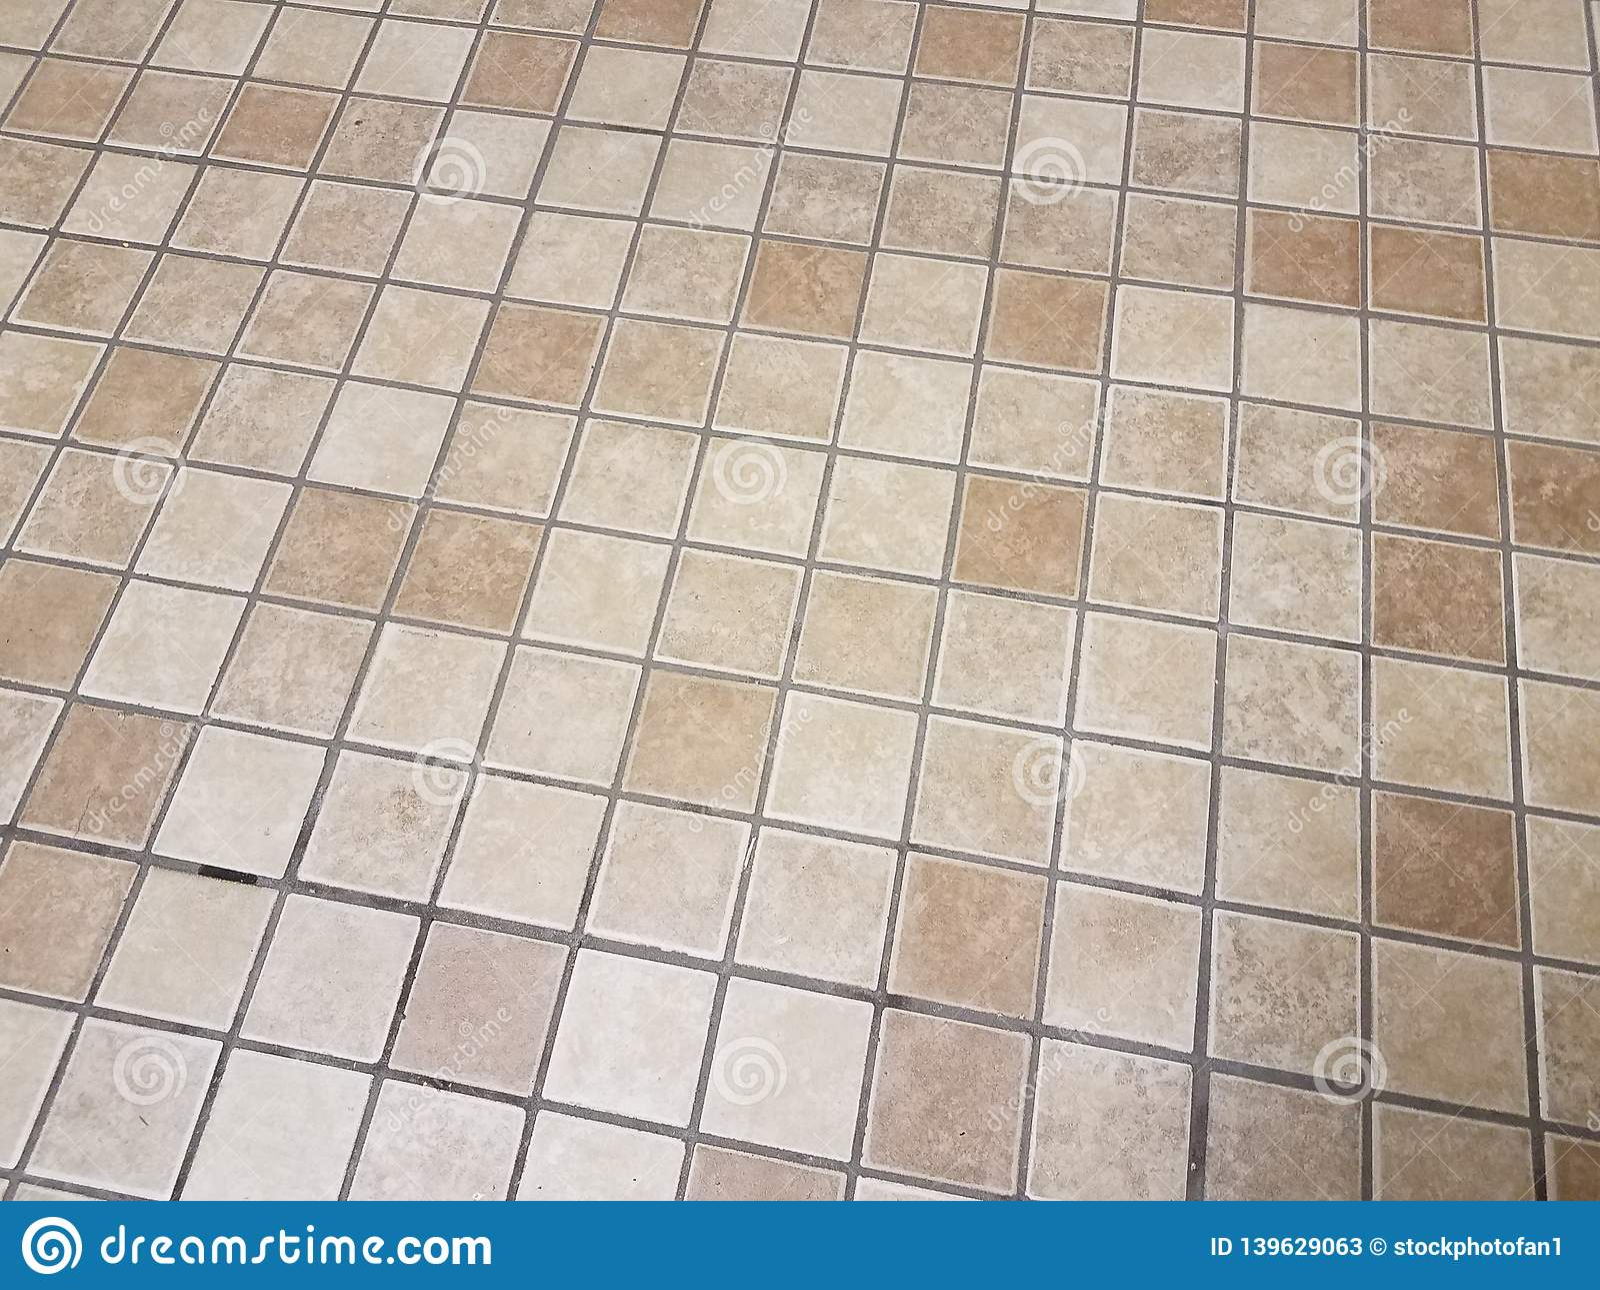 https www dreamstime com tan brown square bathroom tiles floor surface image139629063